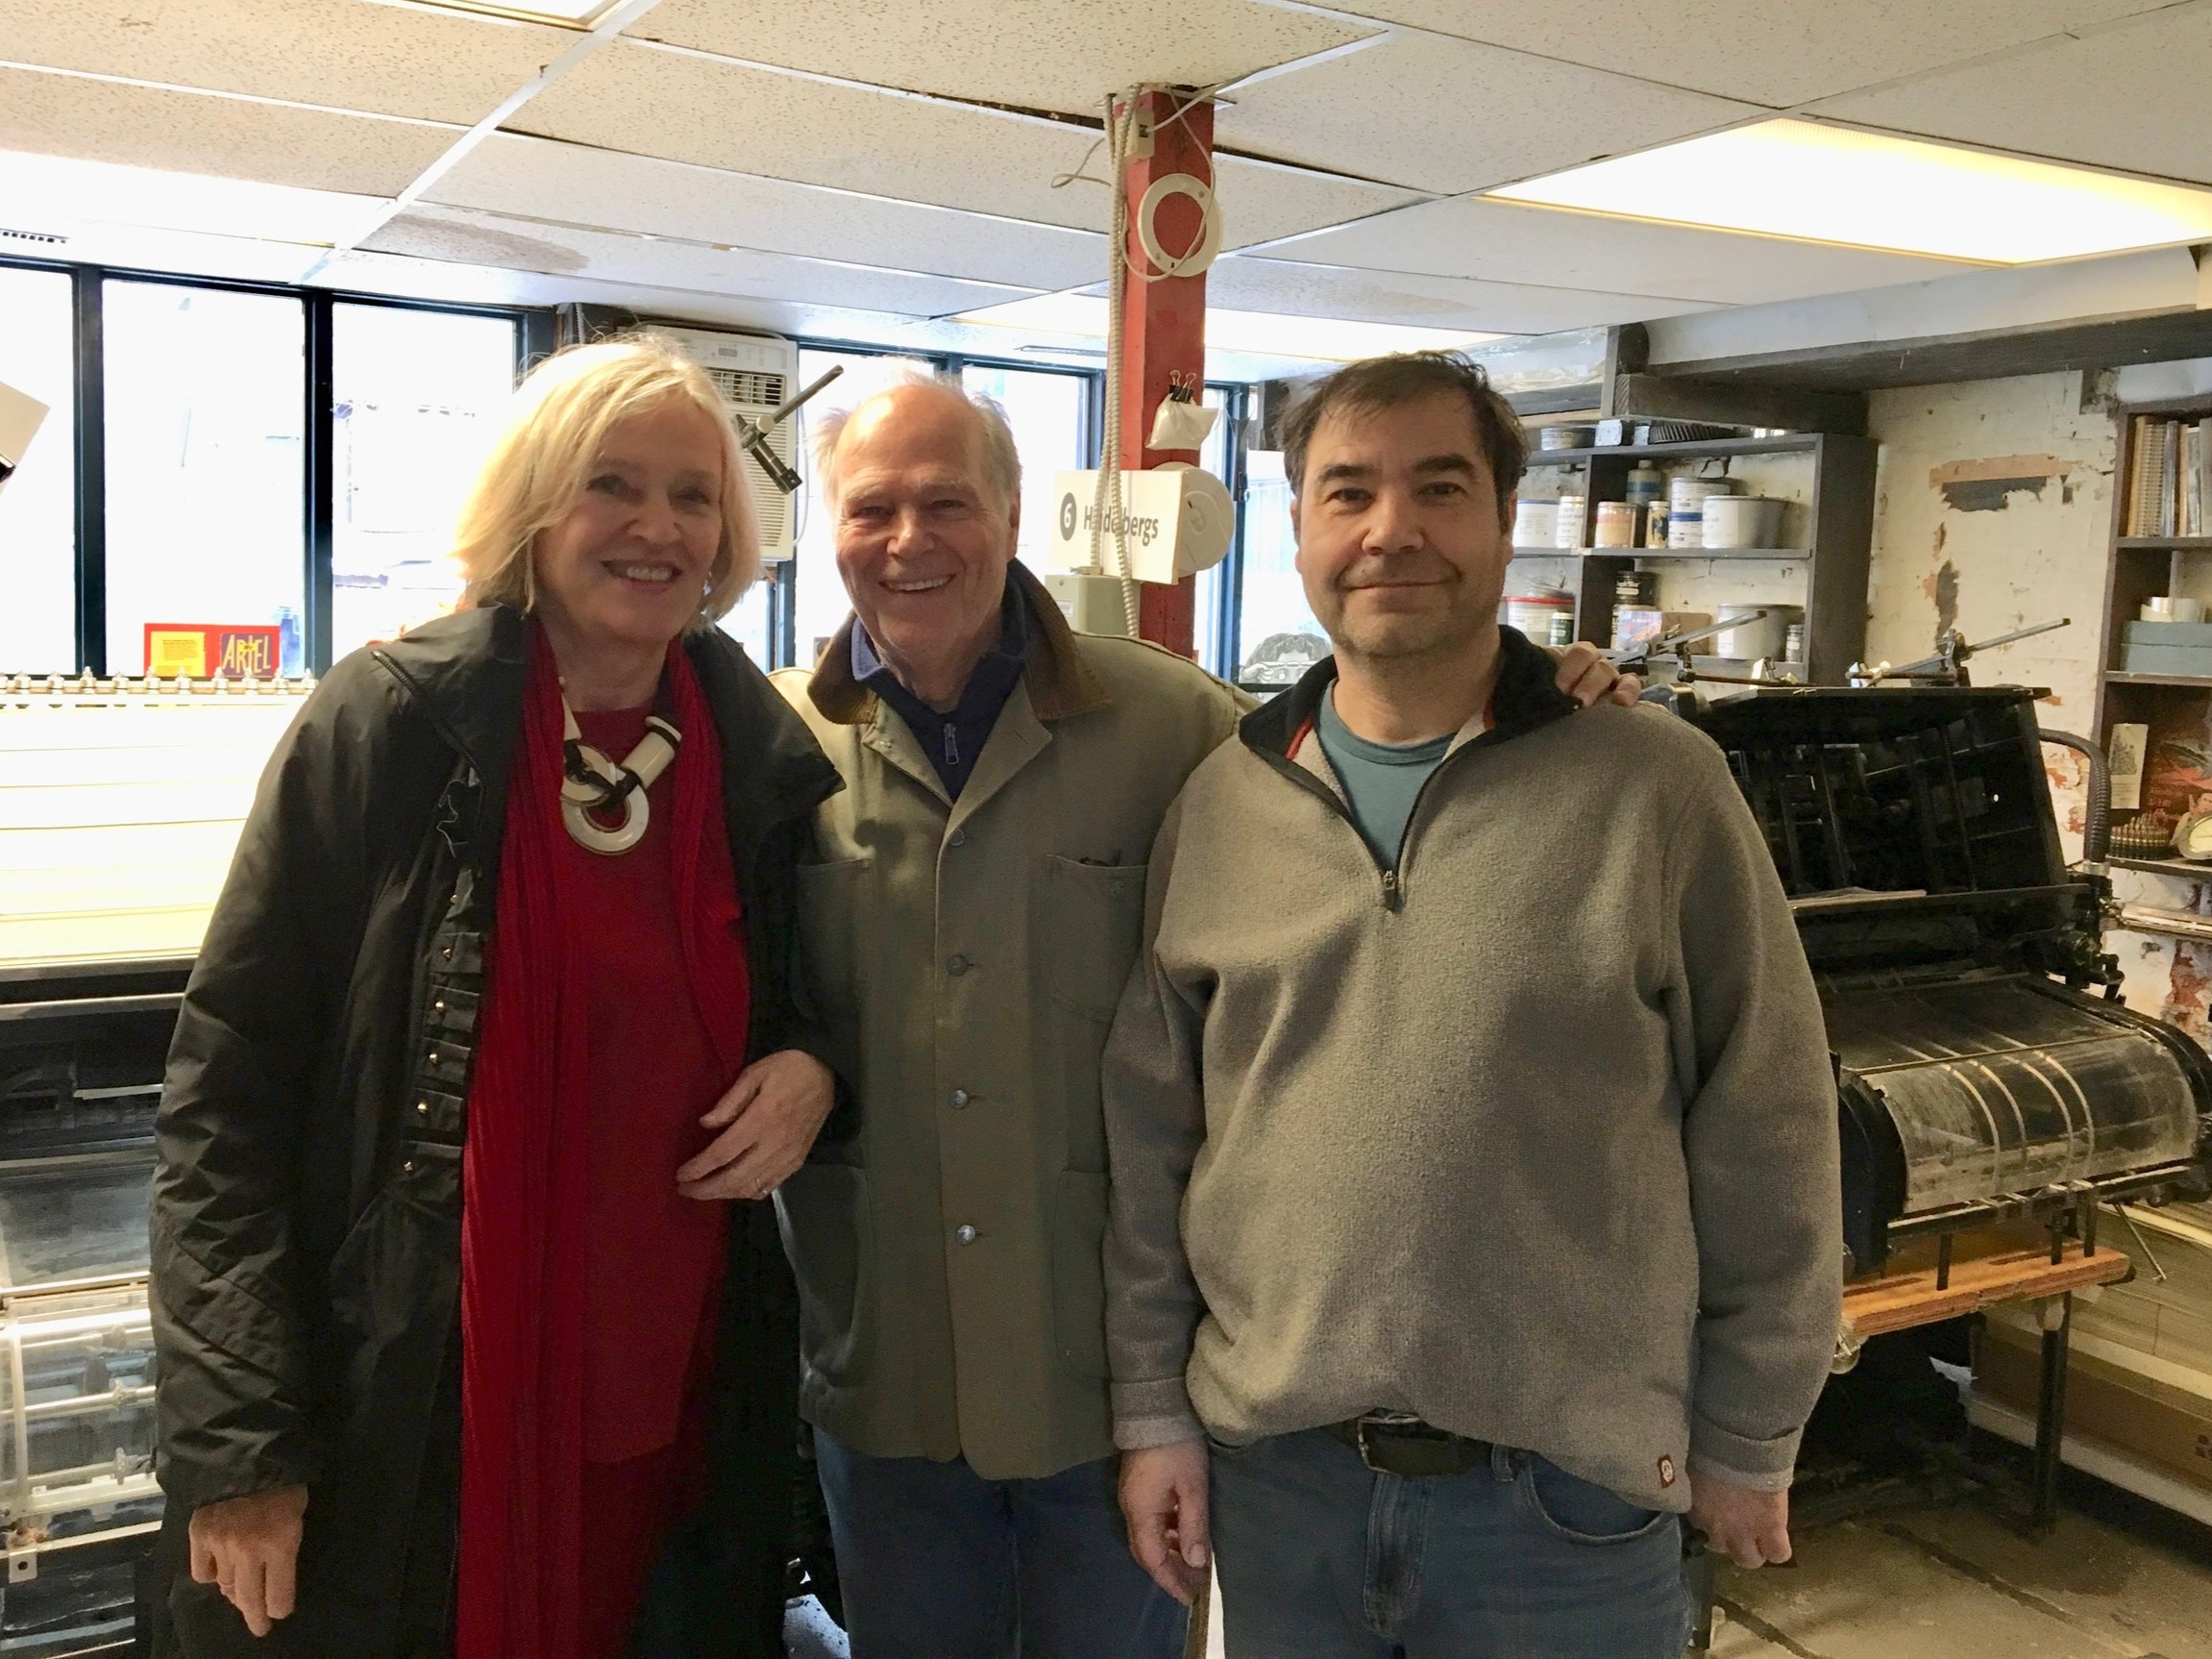 Allan Royal and Kathleen Metcalfe visit our wonderful printer, John De Jesus, at Coach House.